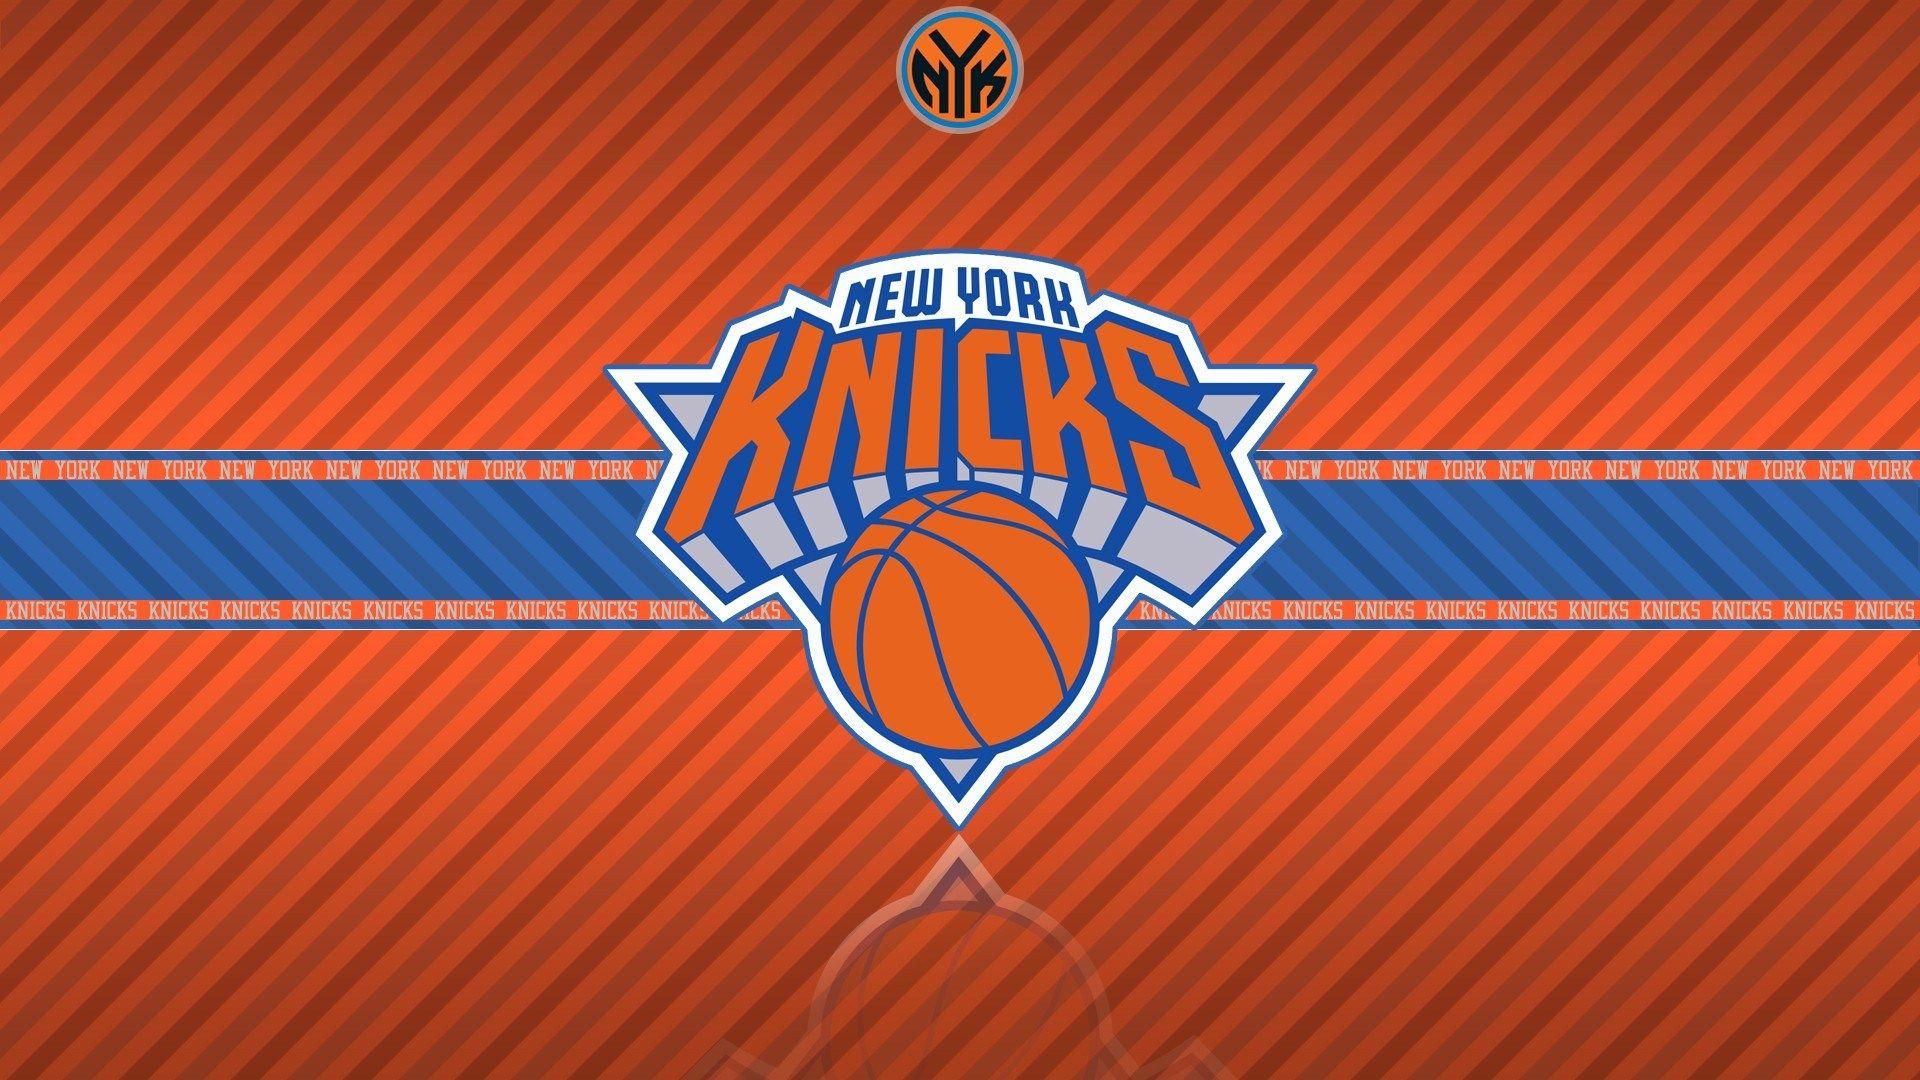 1920x1080 free desktop wallpaper downloads new york knicks